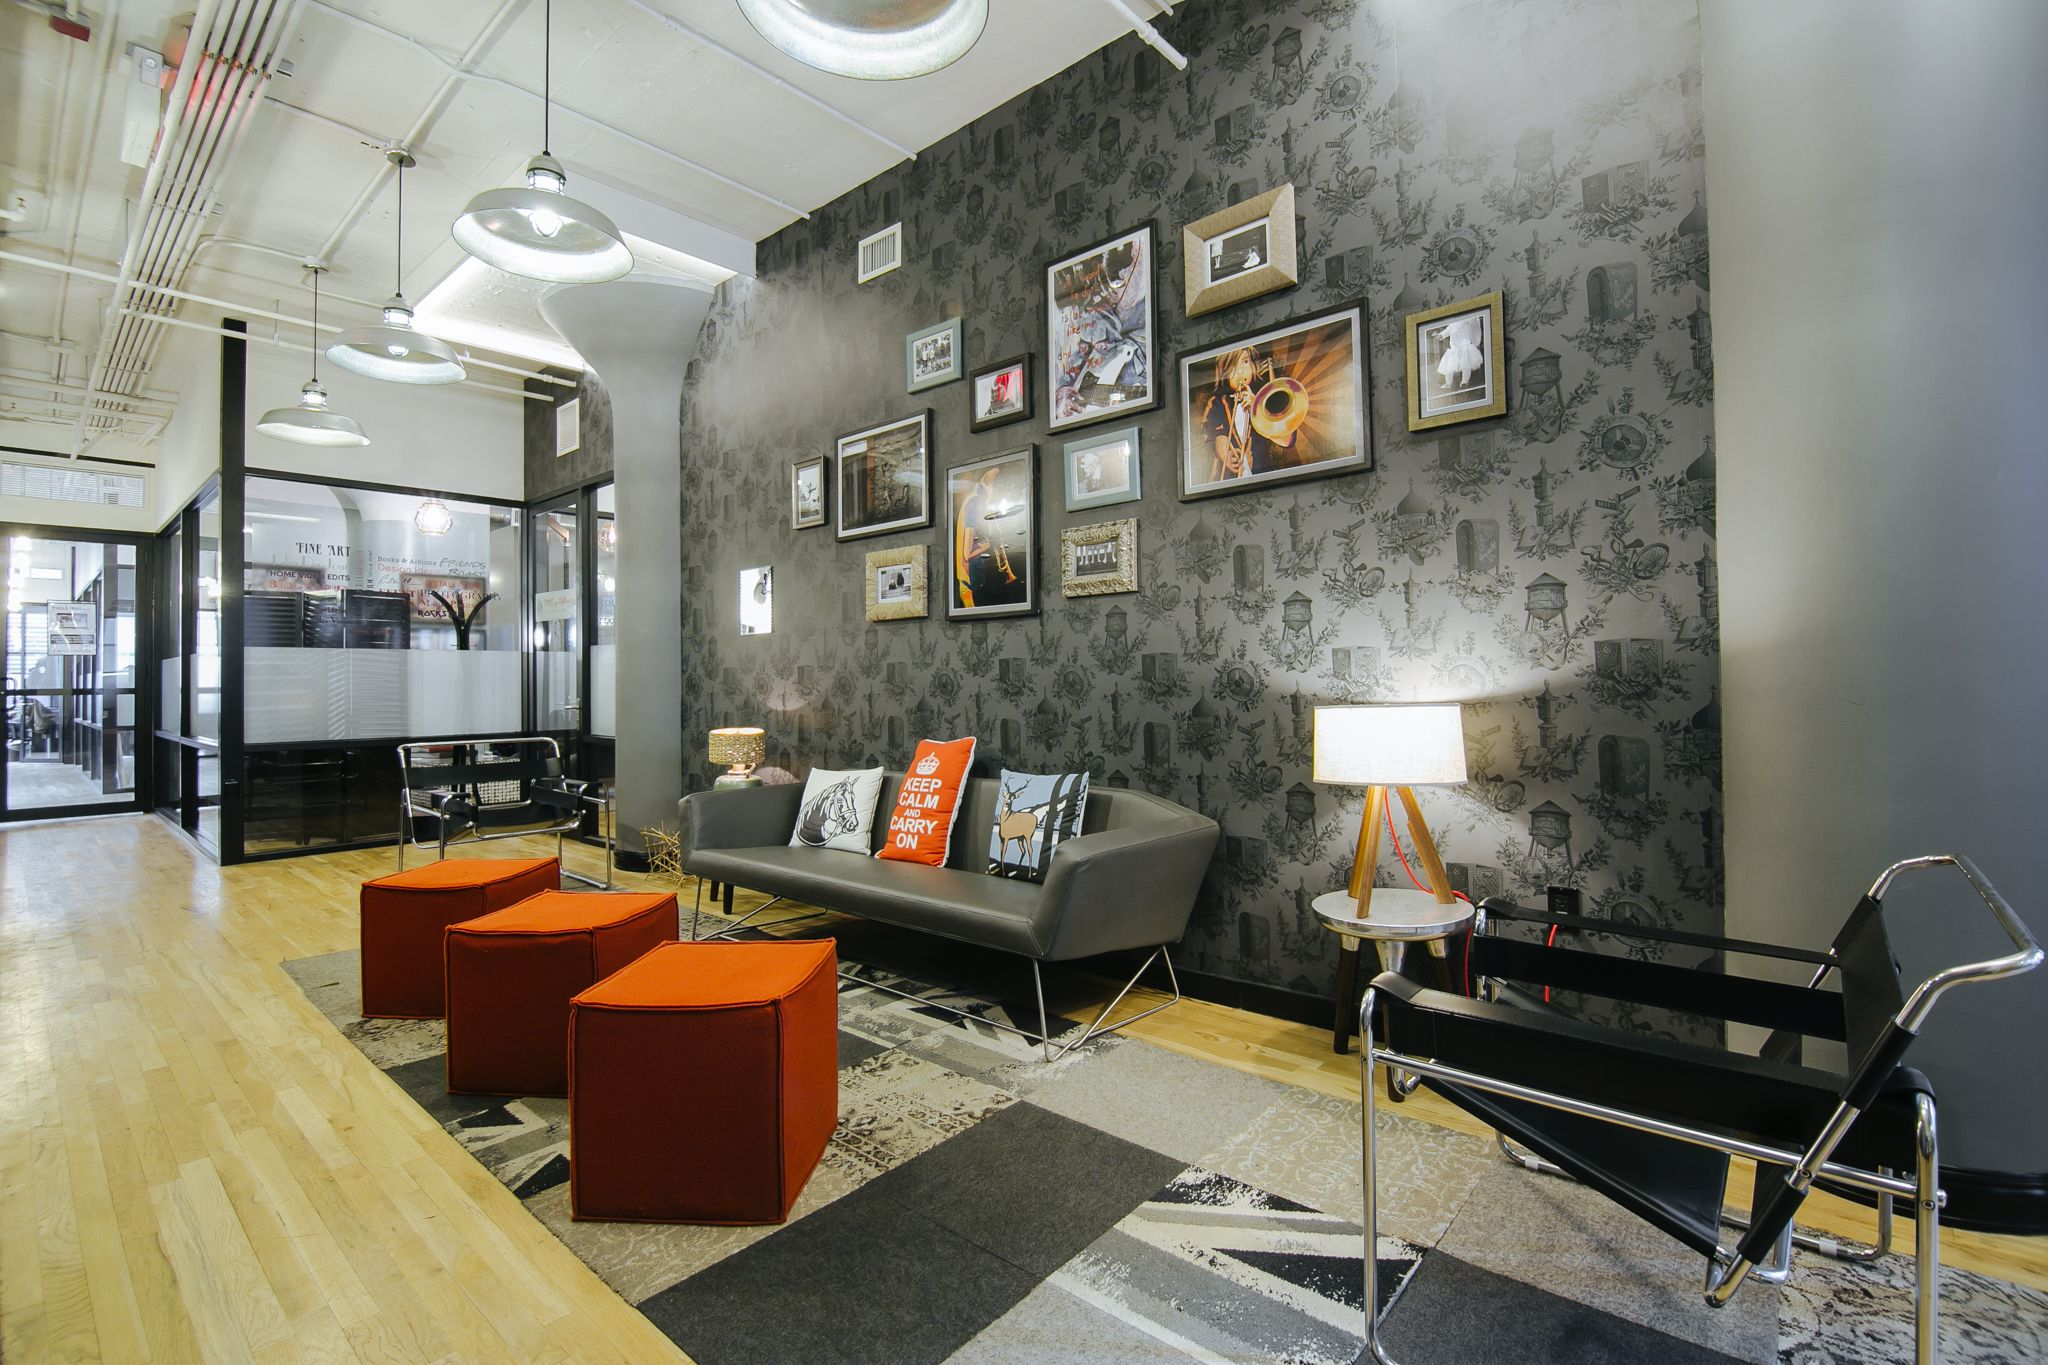 Color art office interiors - Wework Google Search Interior Officeoffice Interiorscollaborative Spacework Spacescolor Artsohoinspiring